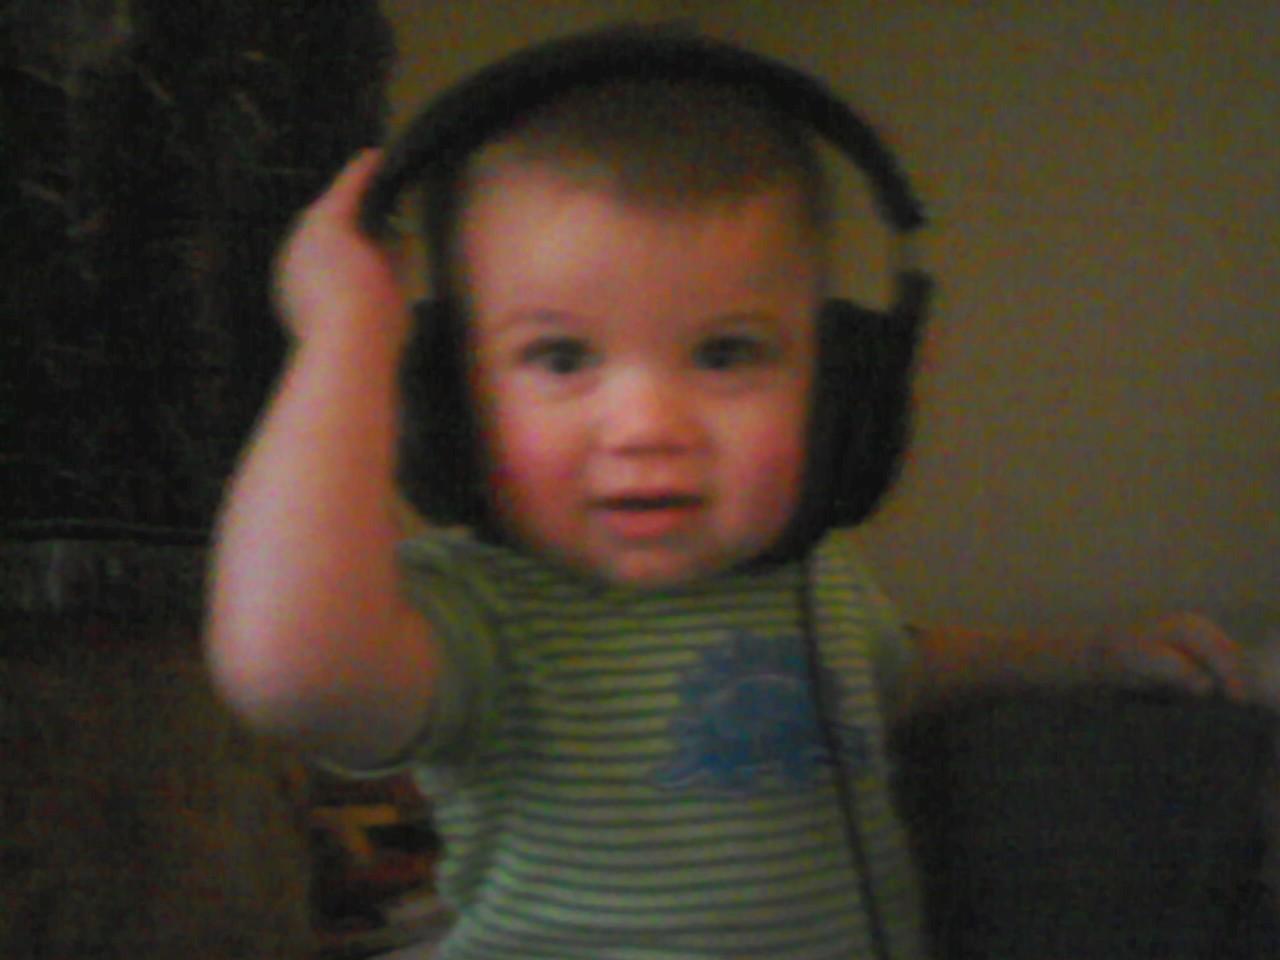 My son Landon into Daddy's stuff